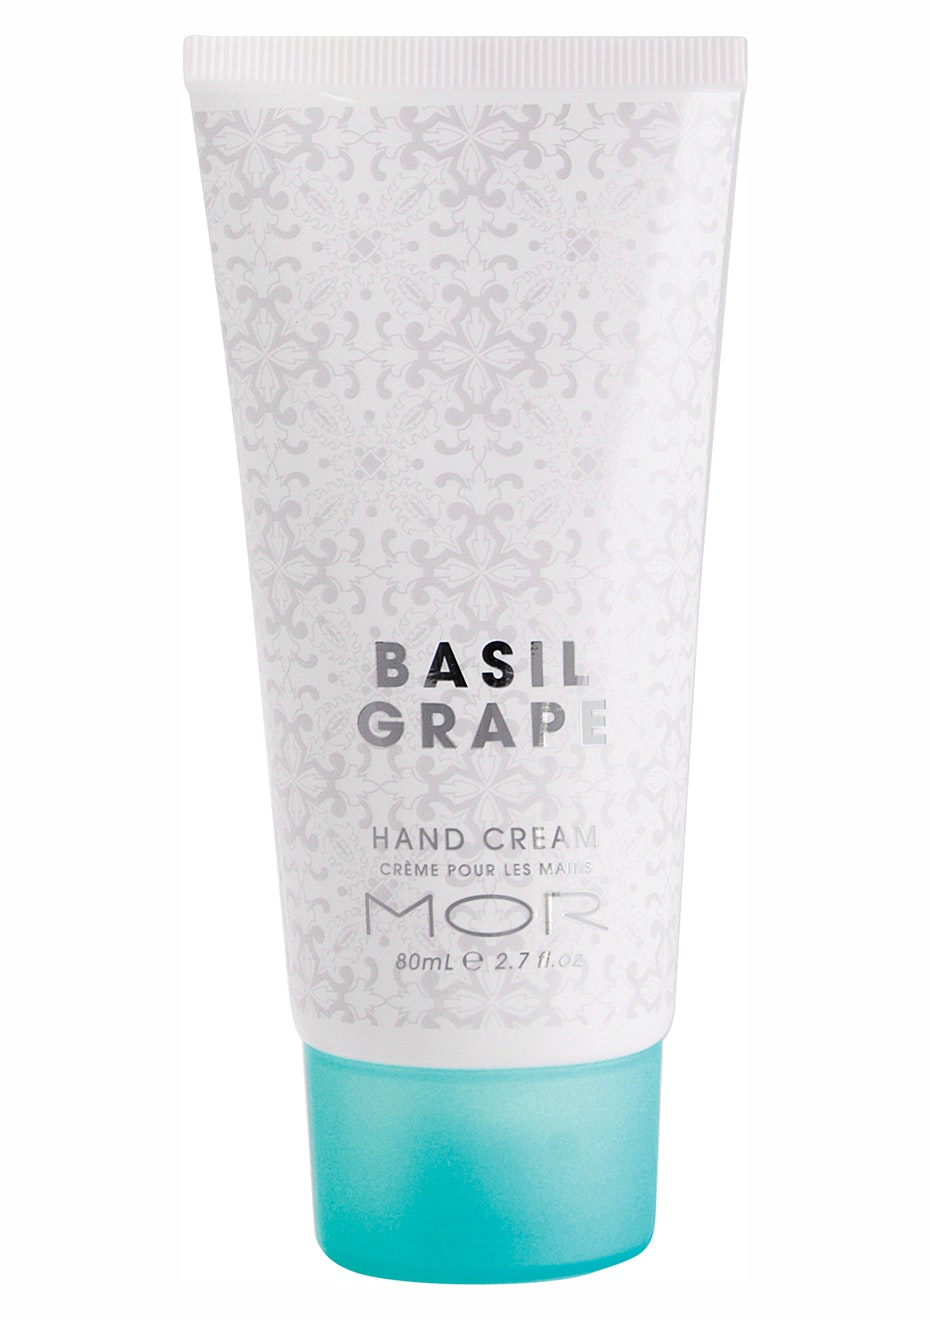 MOR - Hand Cream 80ml Basil Grape